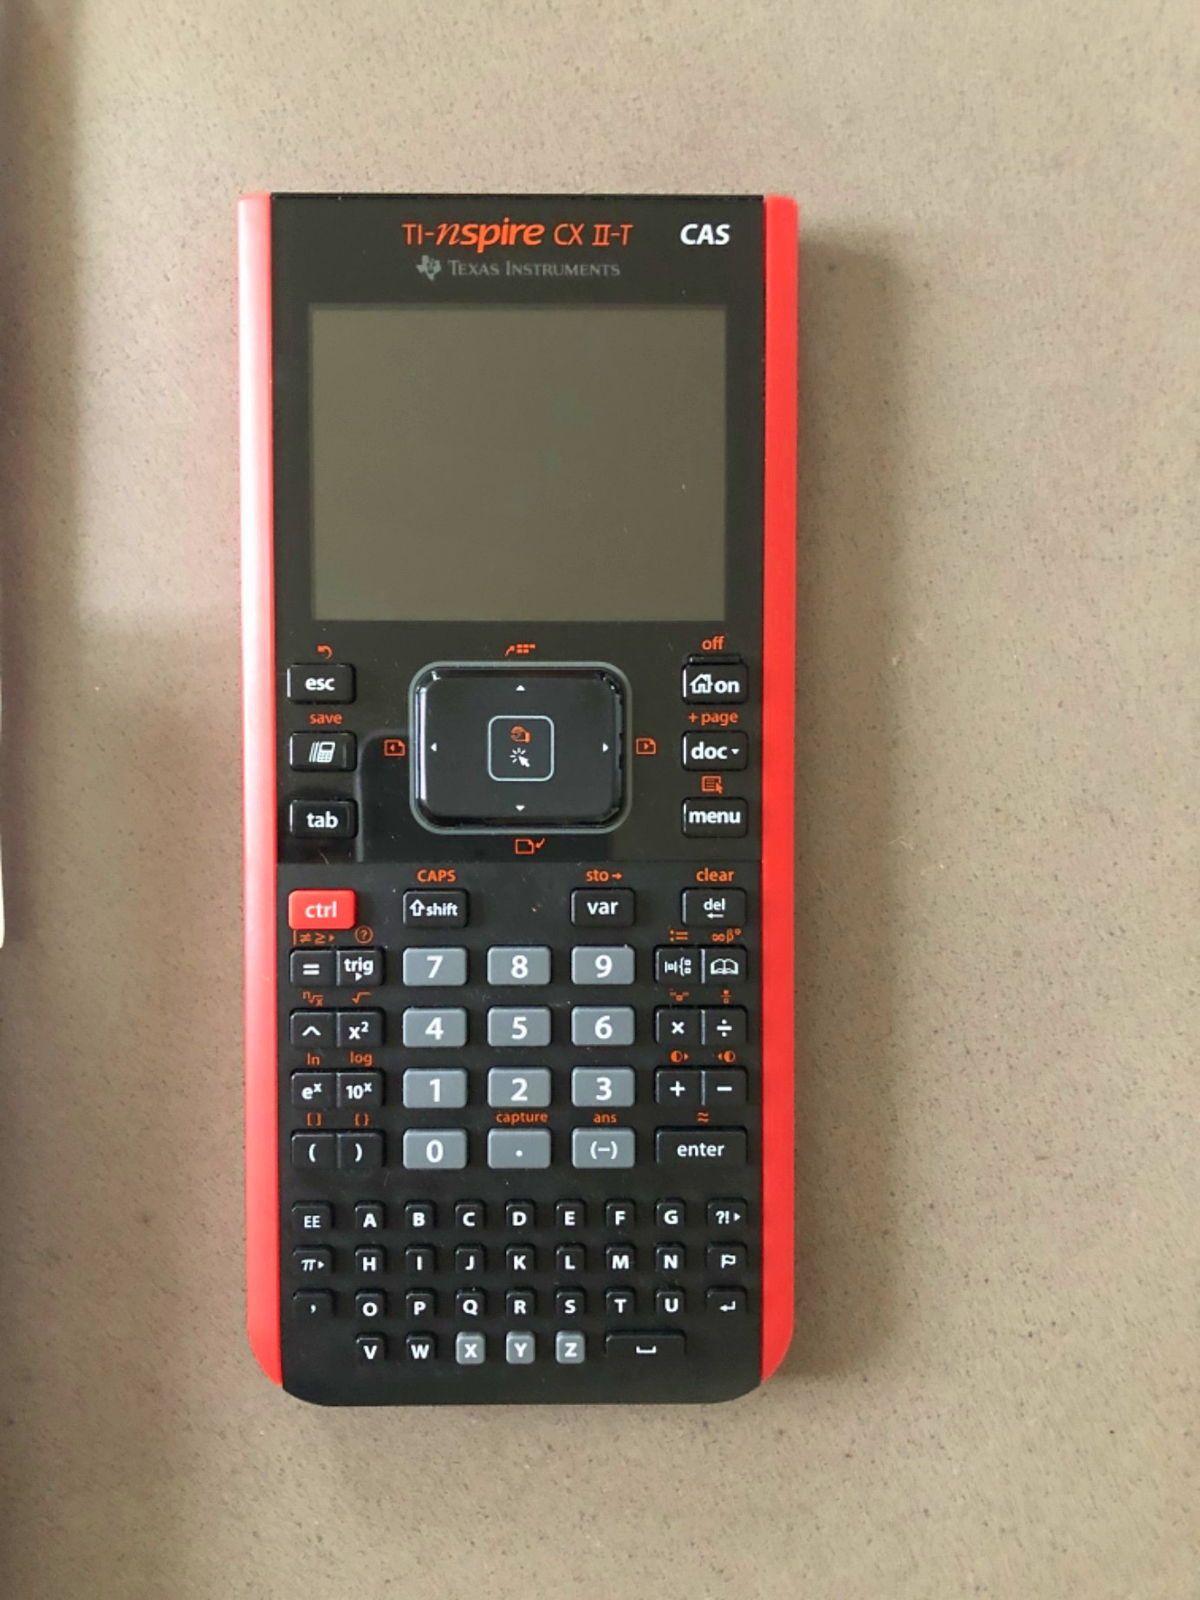 Calculatrice graphique Texas Instruments Ti-nspire CX IIT CAS